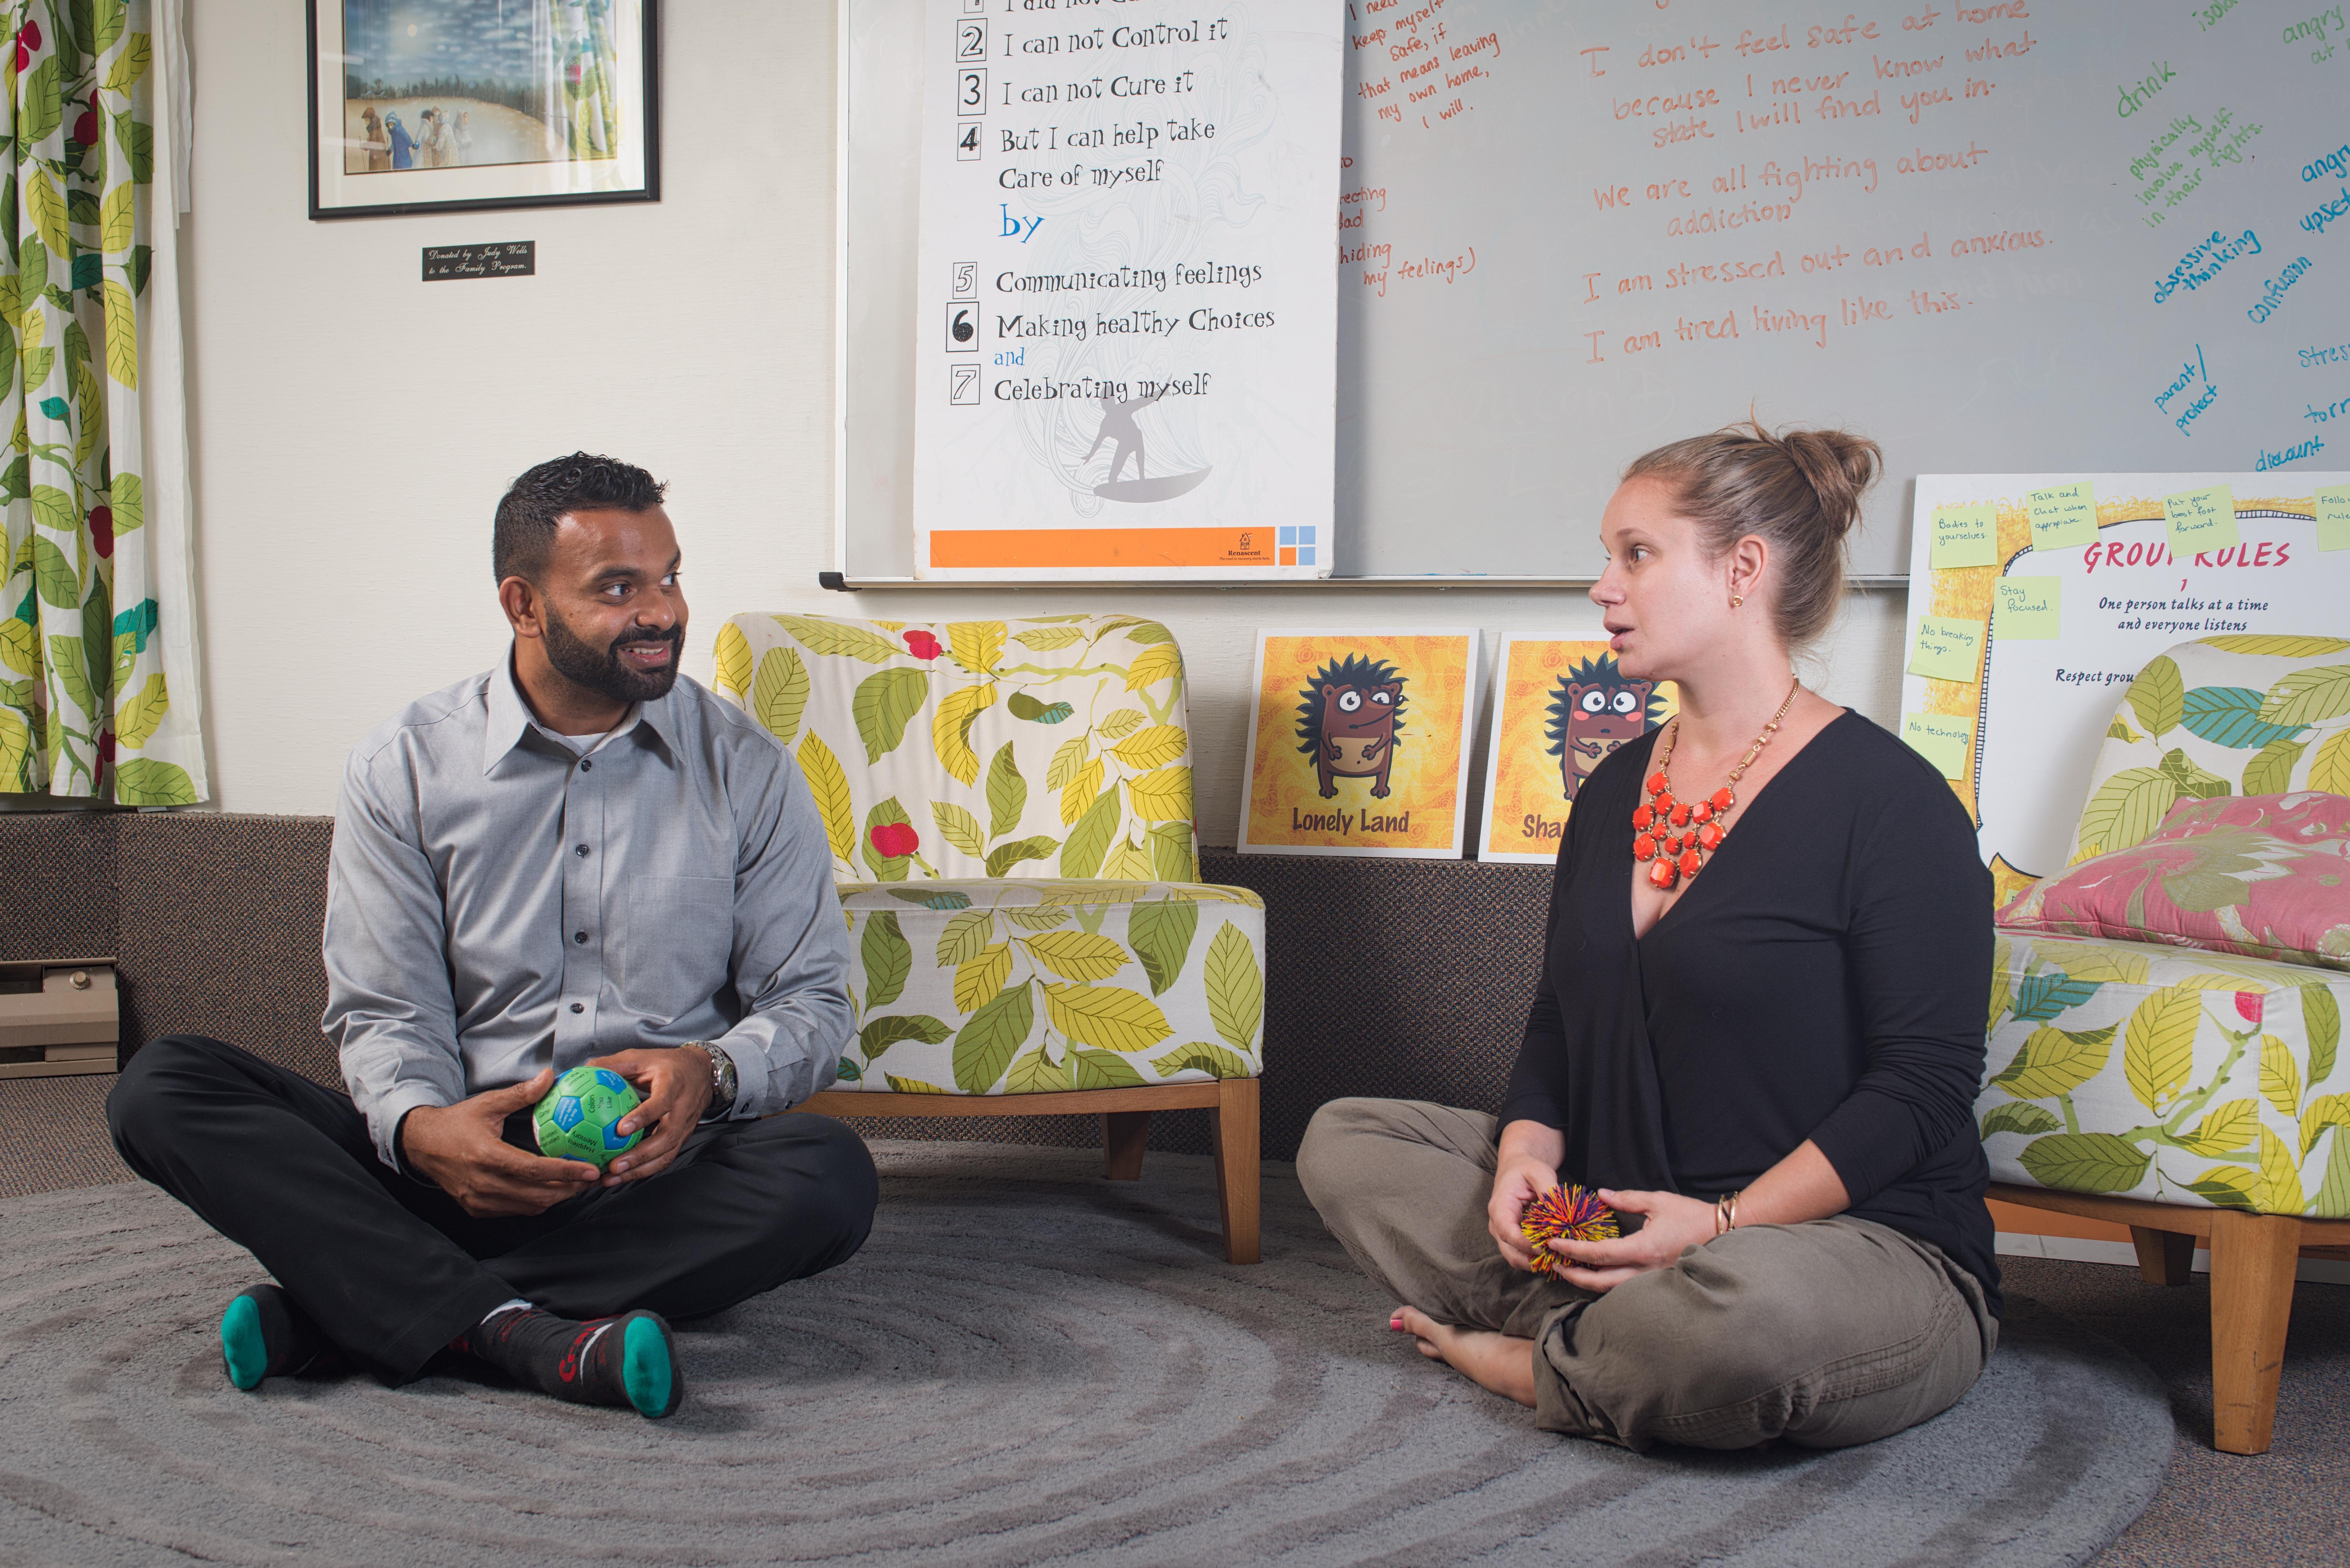 Sunil (left) and Christine (right) facilitate a Children's Healthy Coping Skills program.